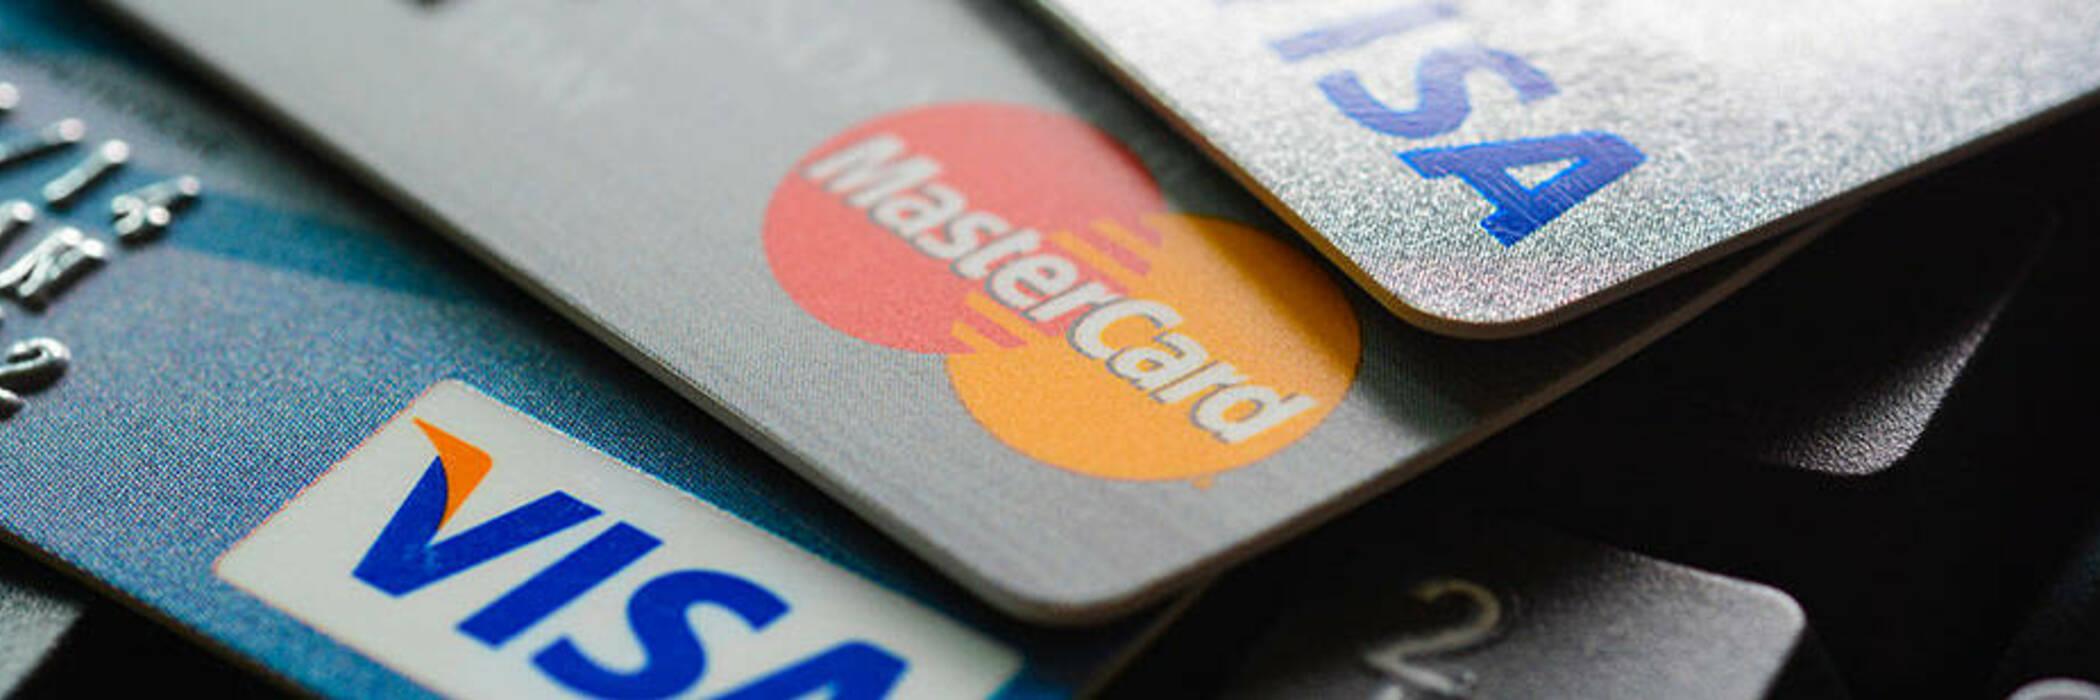 Stack of Visa and MasterCard credit cards on keyboard.